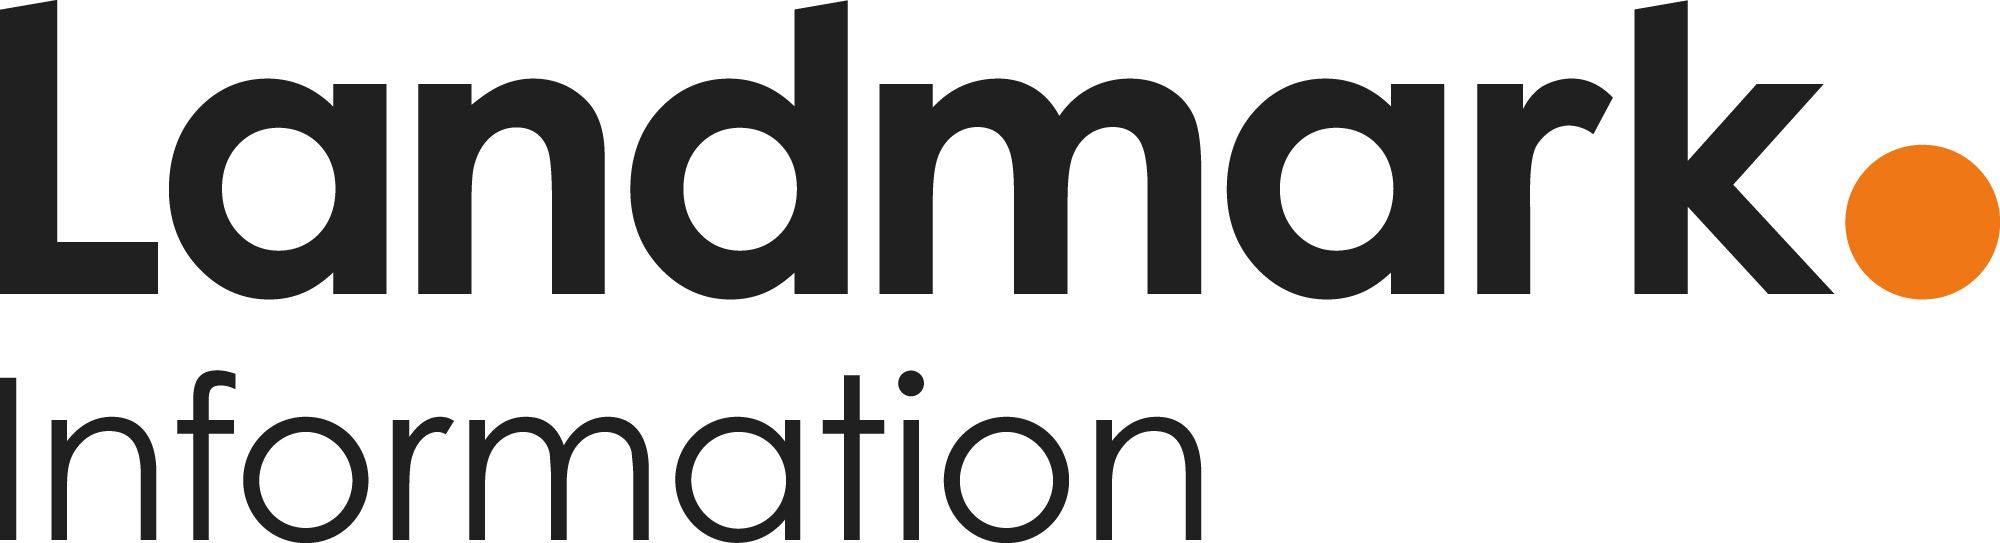 Landmark Information Group